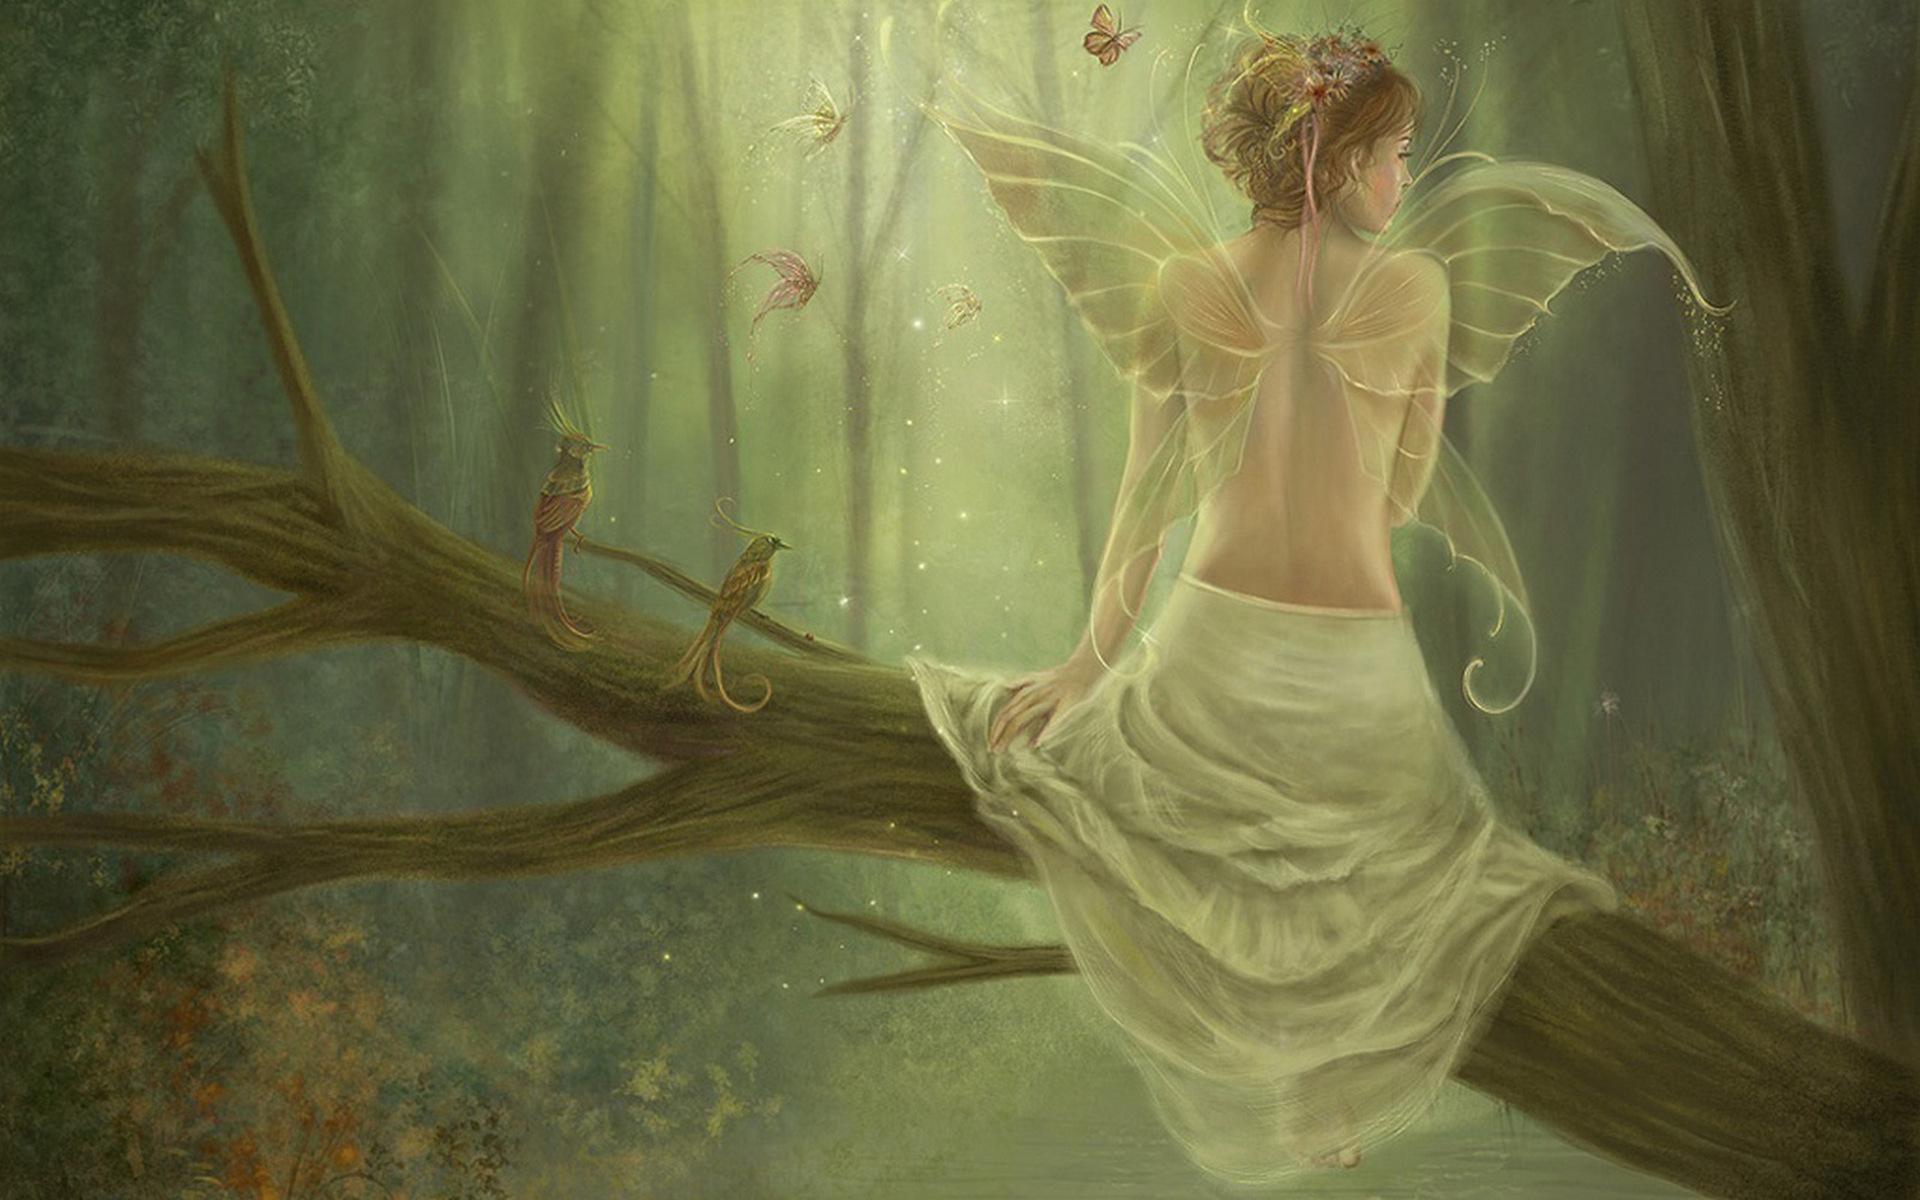 Fantasy Fairy Wallpaper Hd 4 High Resolution Wallpaper Wallpaper 1920x1200